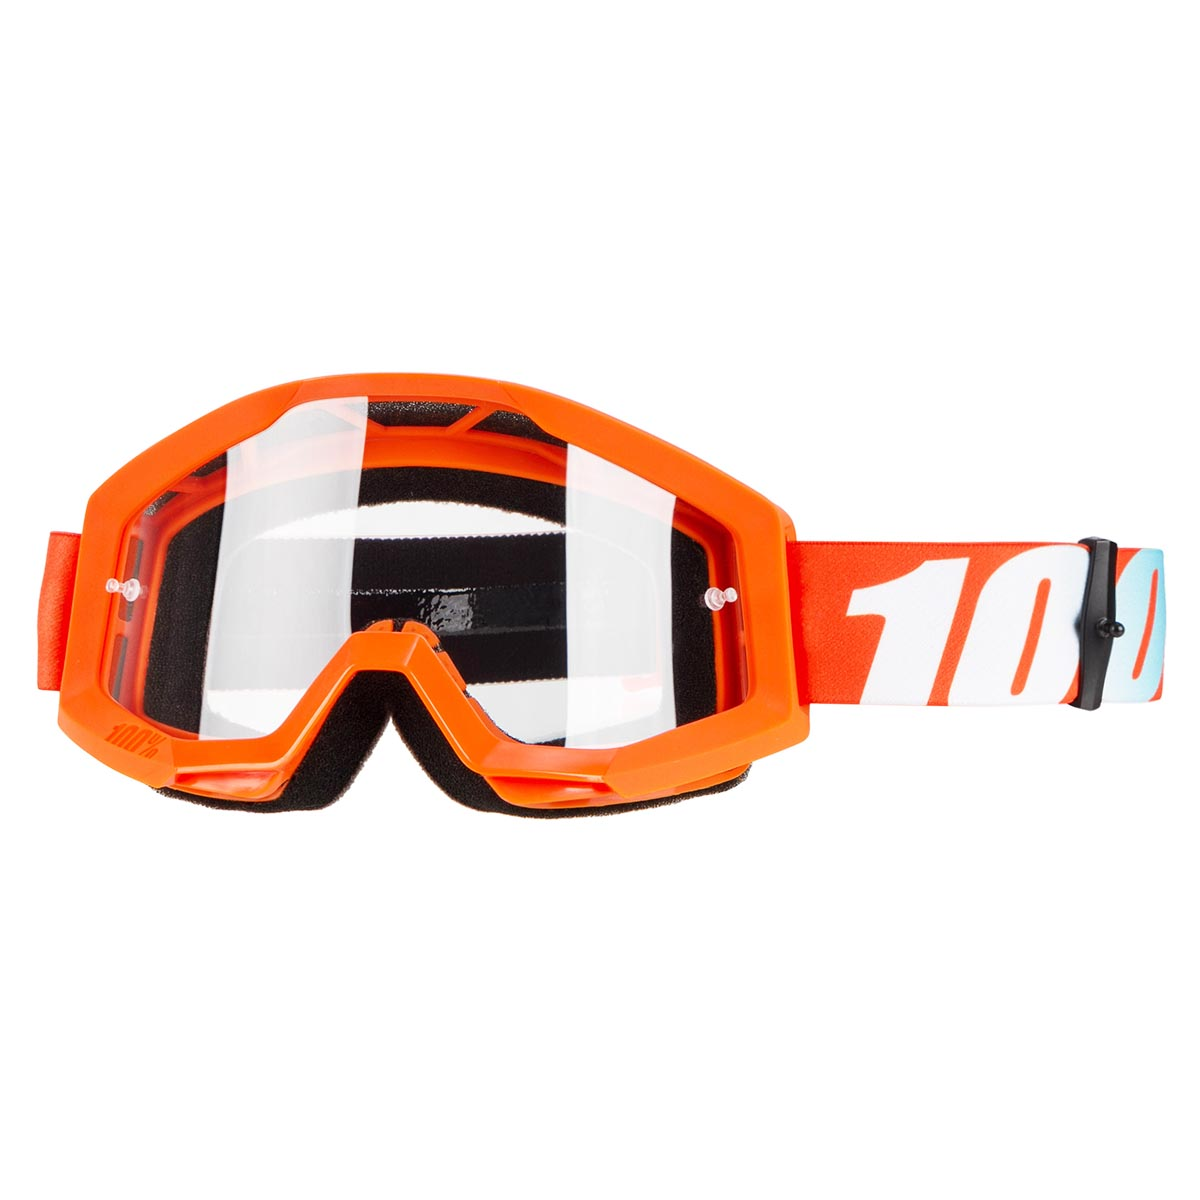 100% Crossbrille The Strata Orange - Klar Anti-Fog